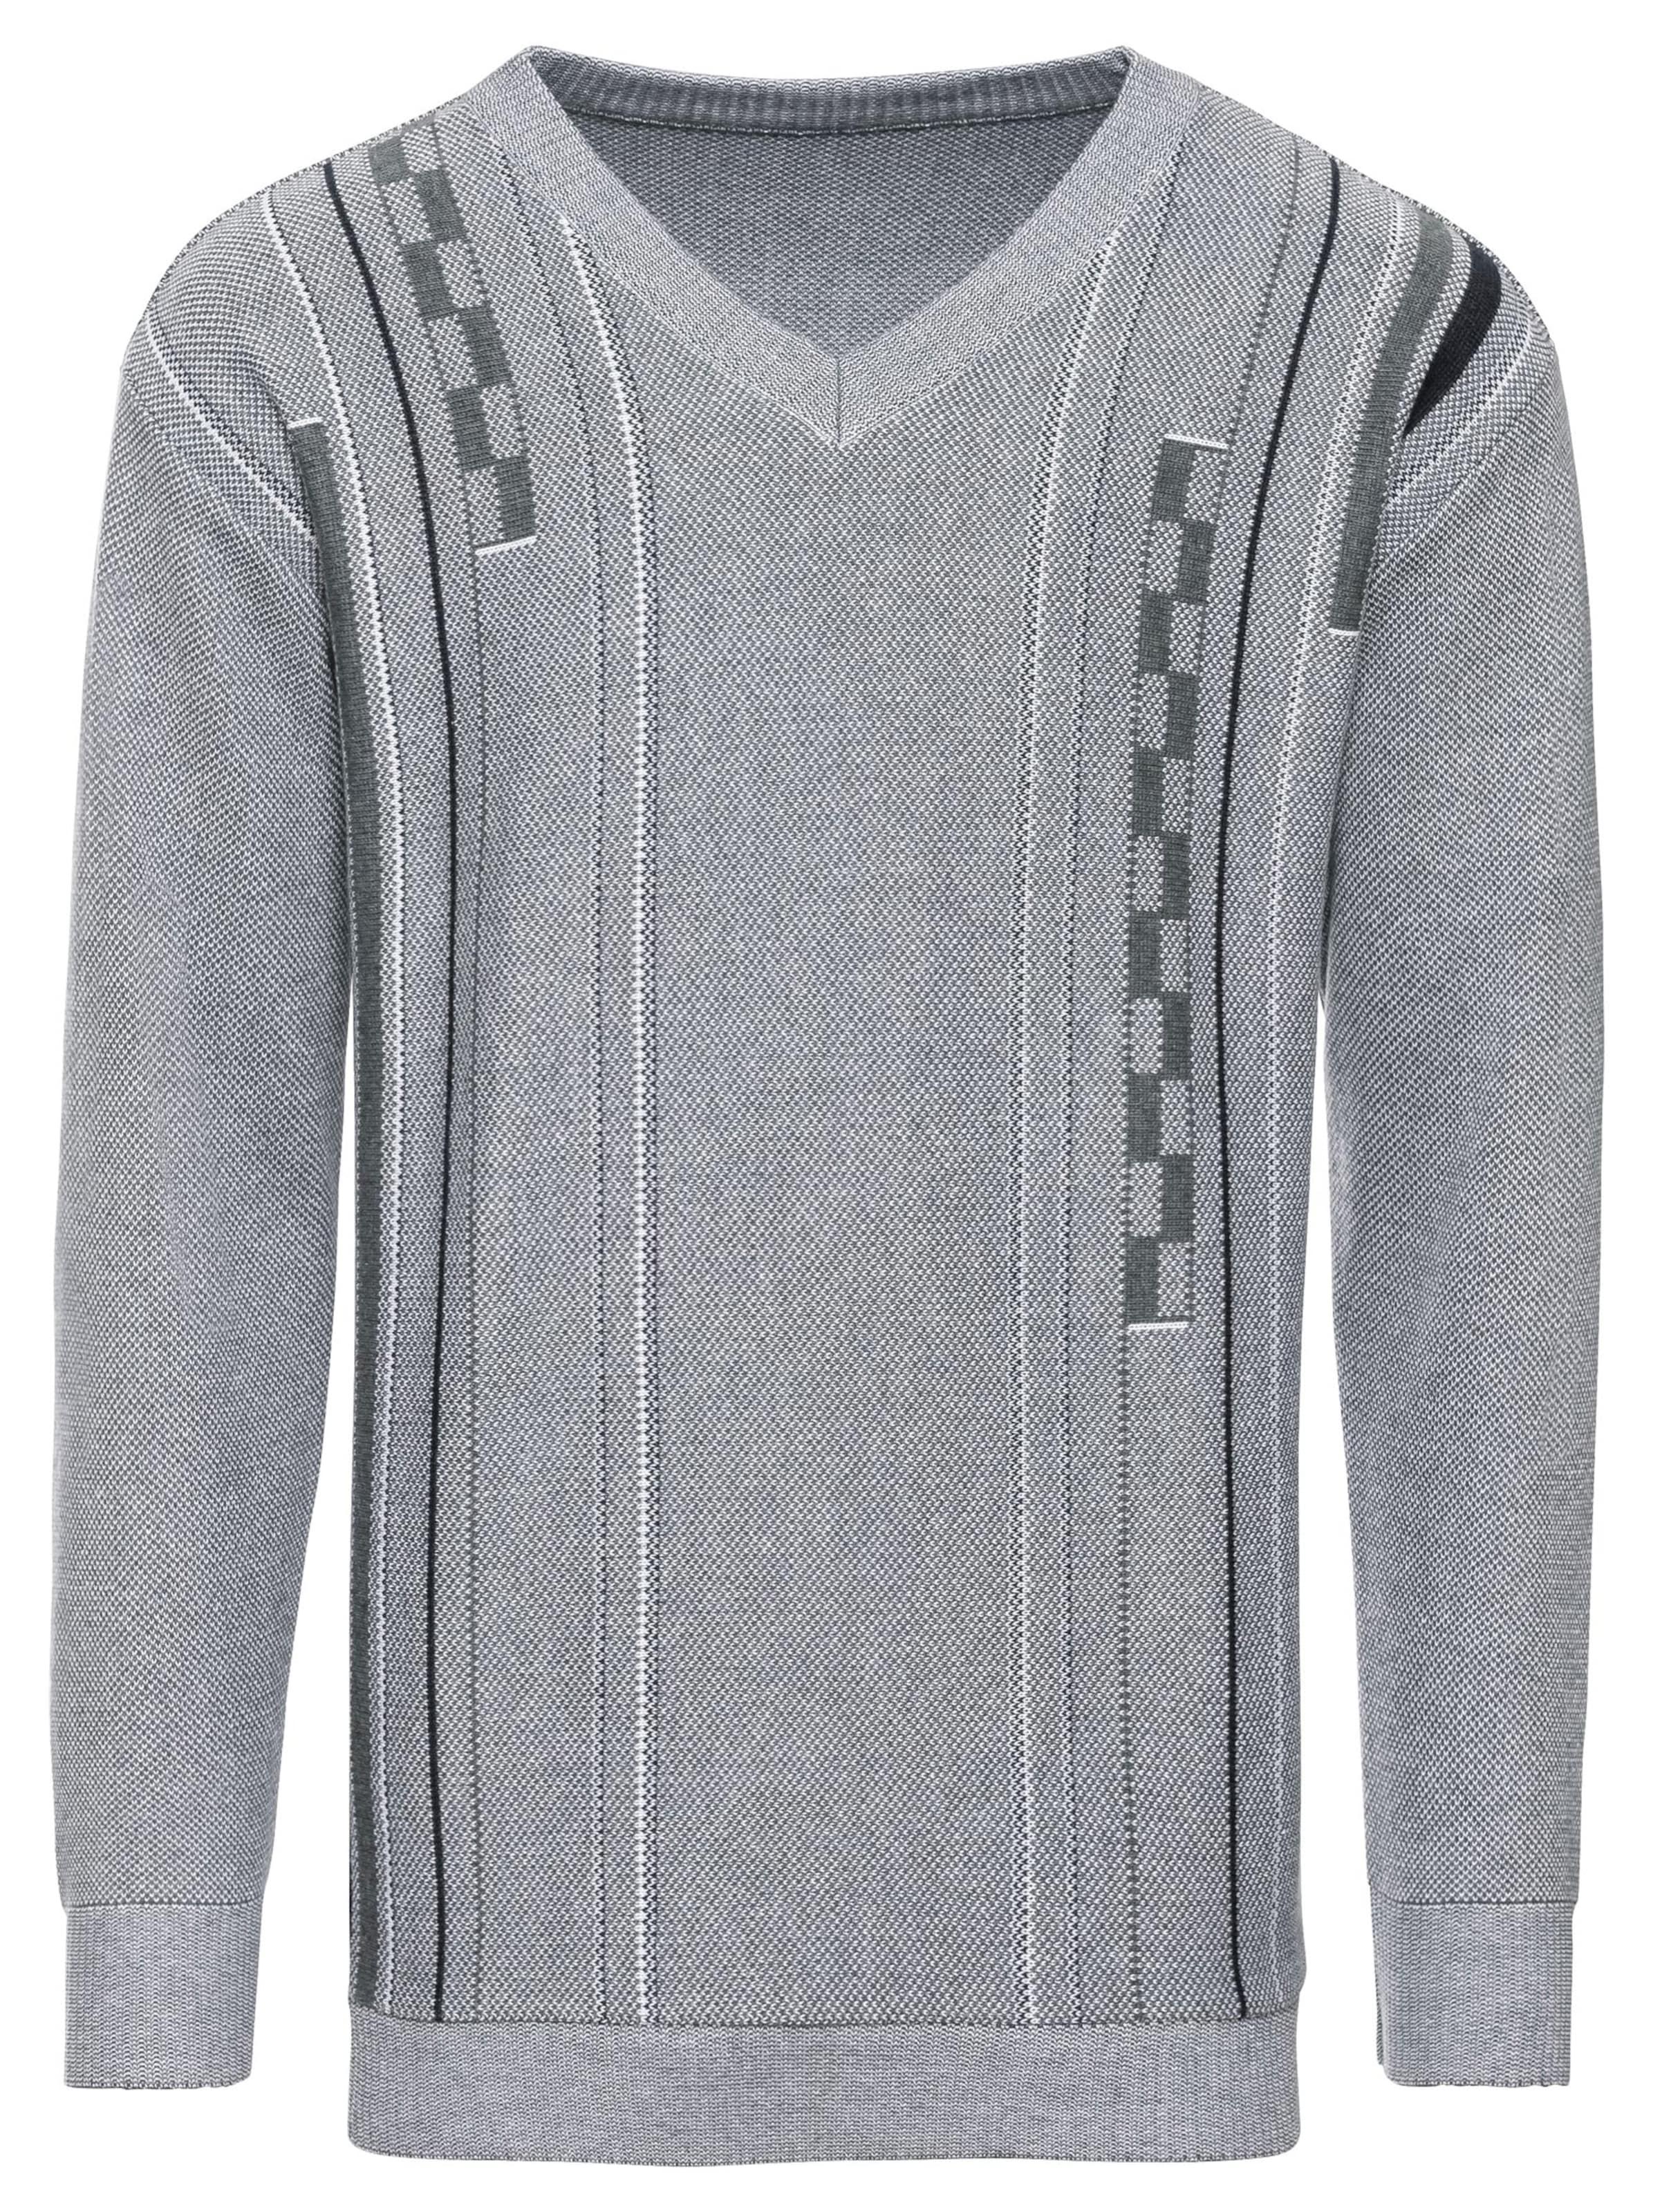 witt weiden - Herren Pullover grau-gemustert